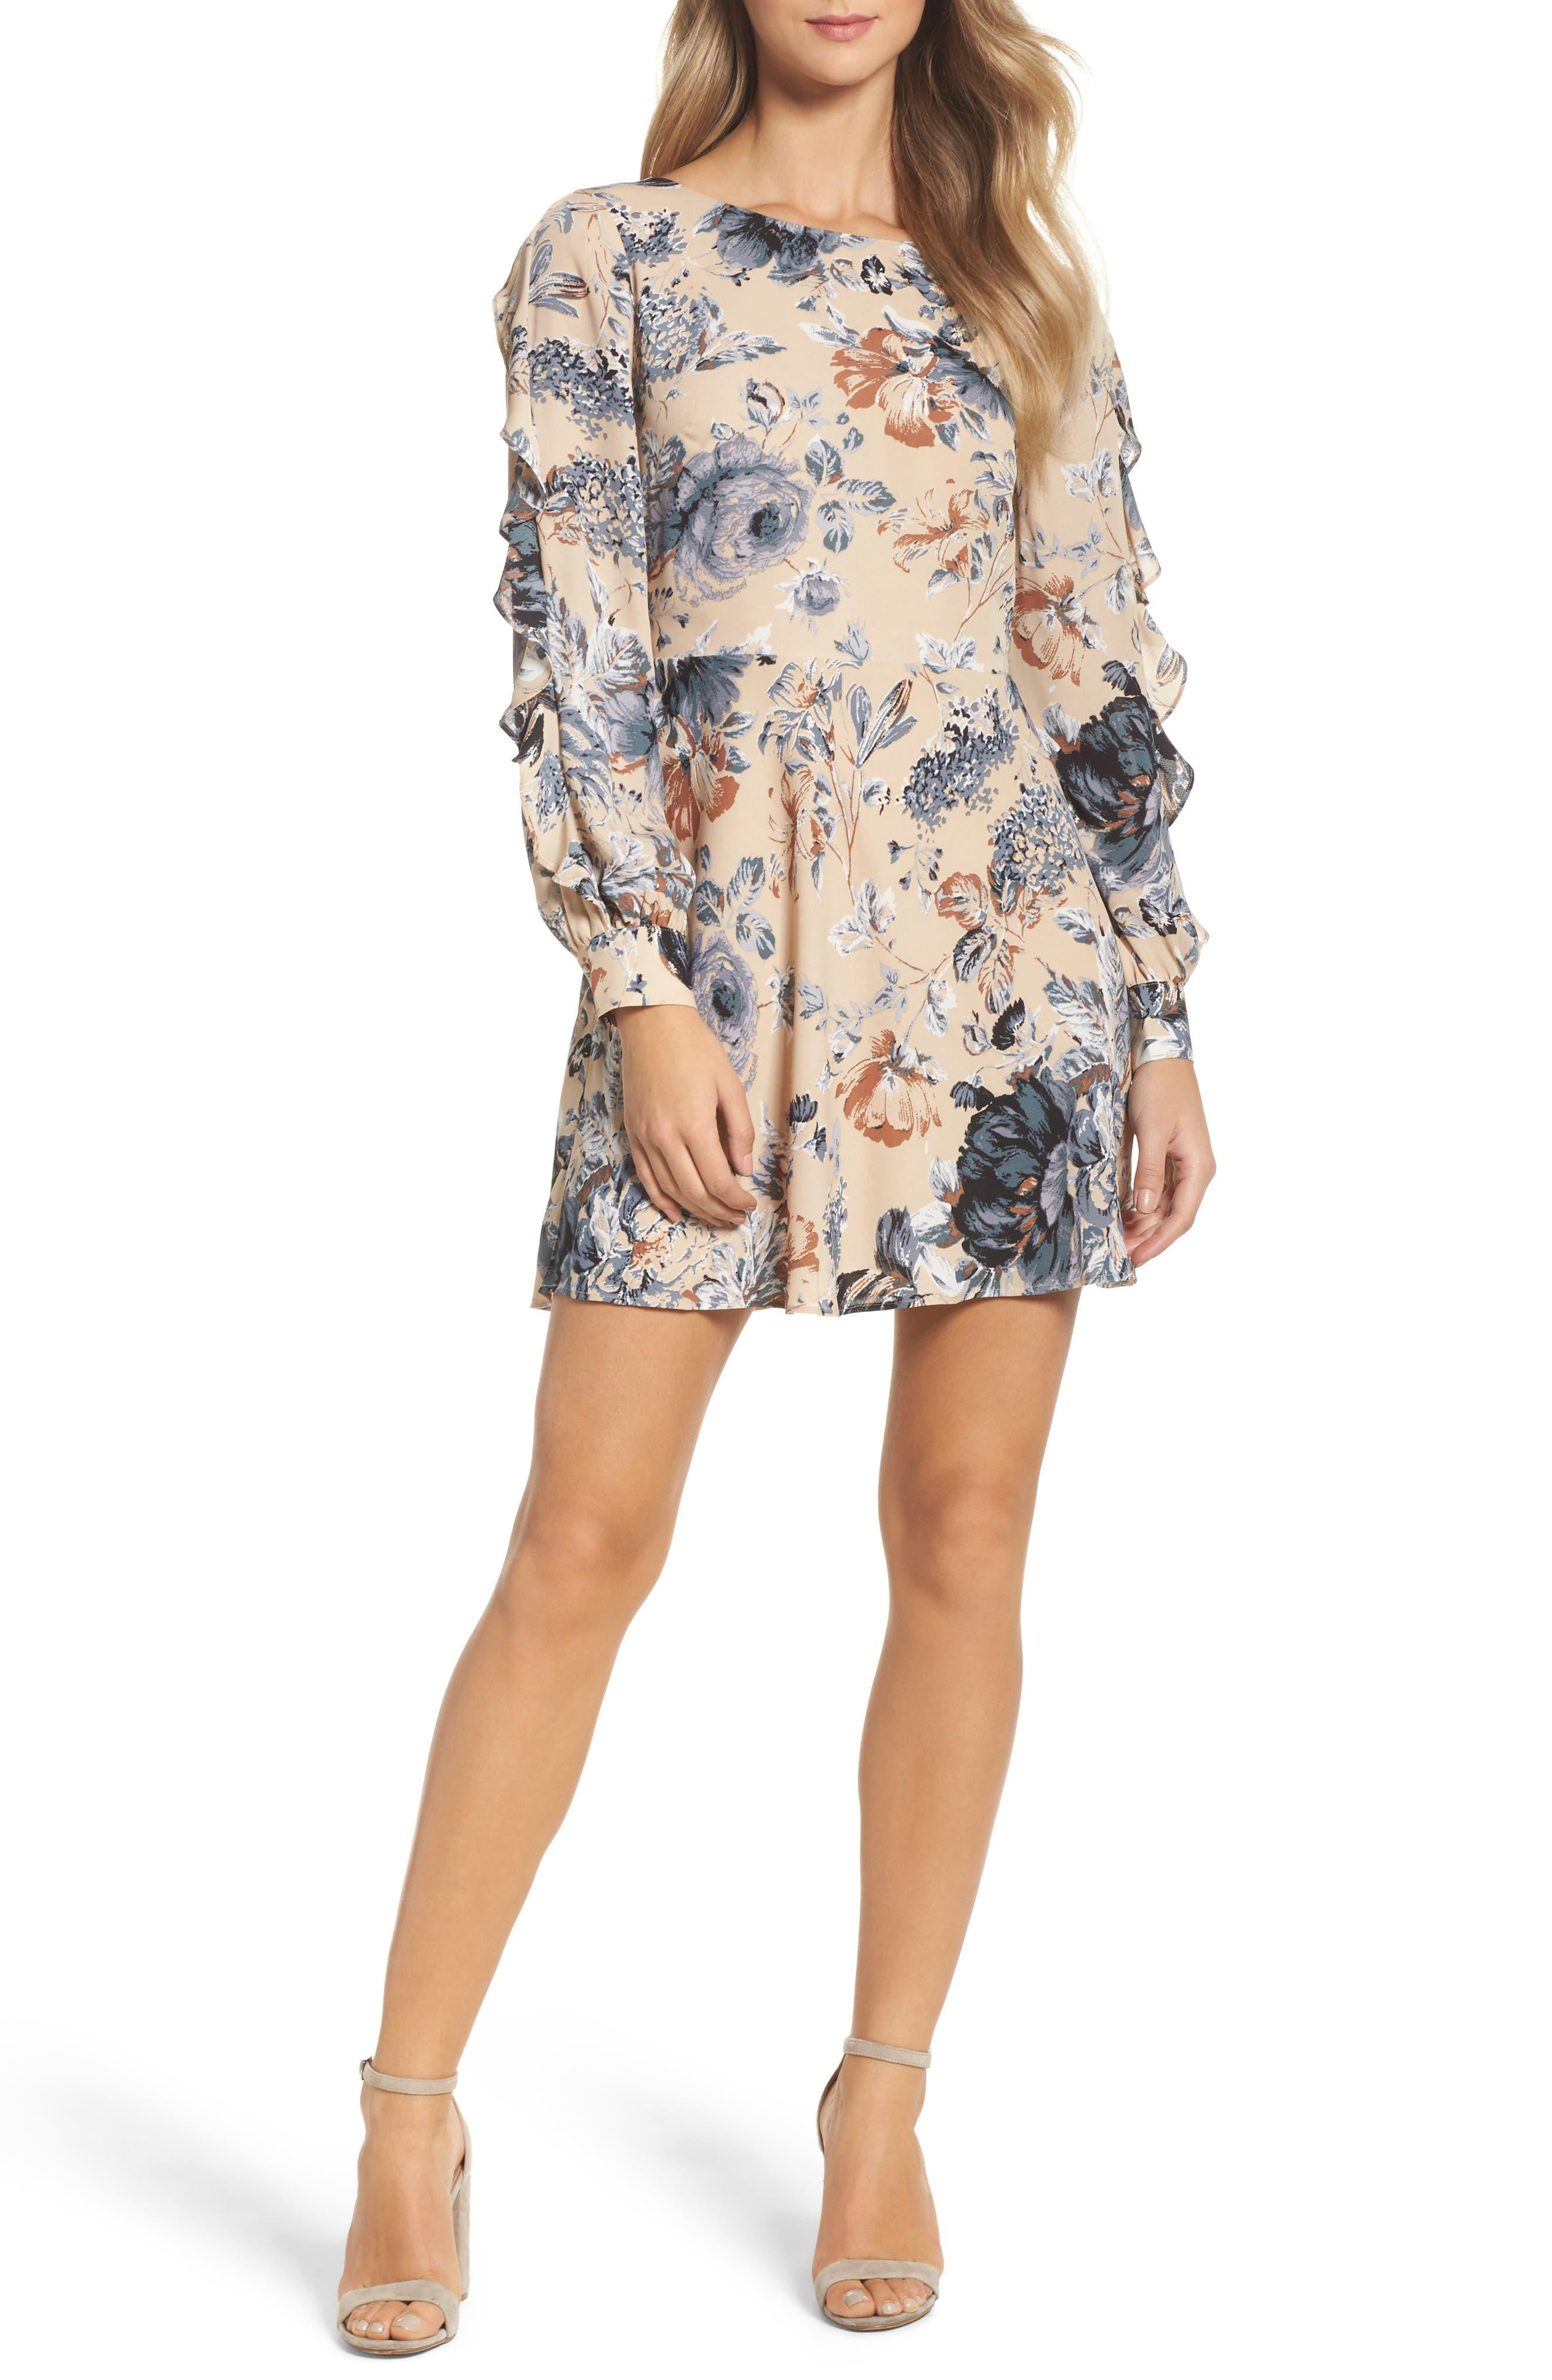 Ali & Jay Merci Floral Fit & Flare Dress